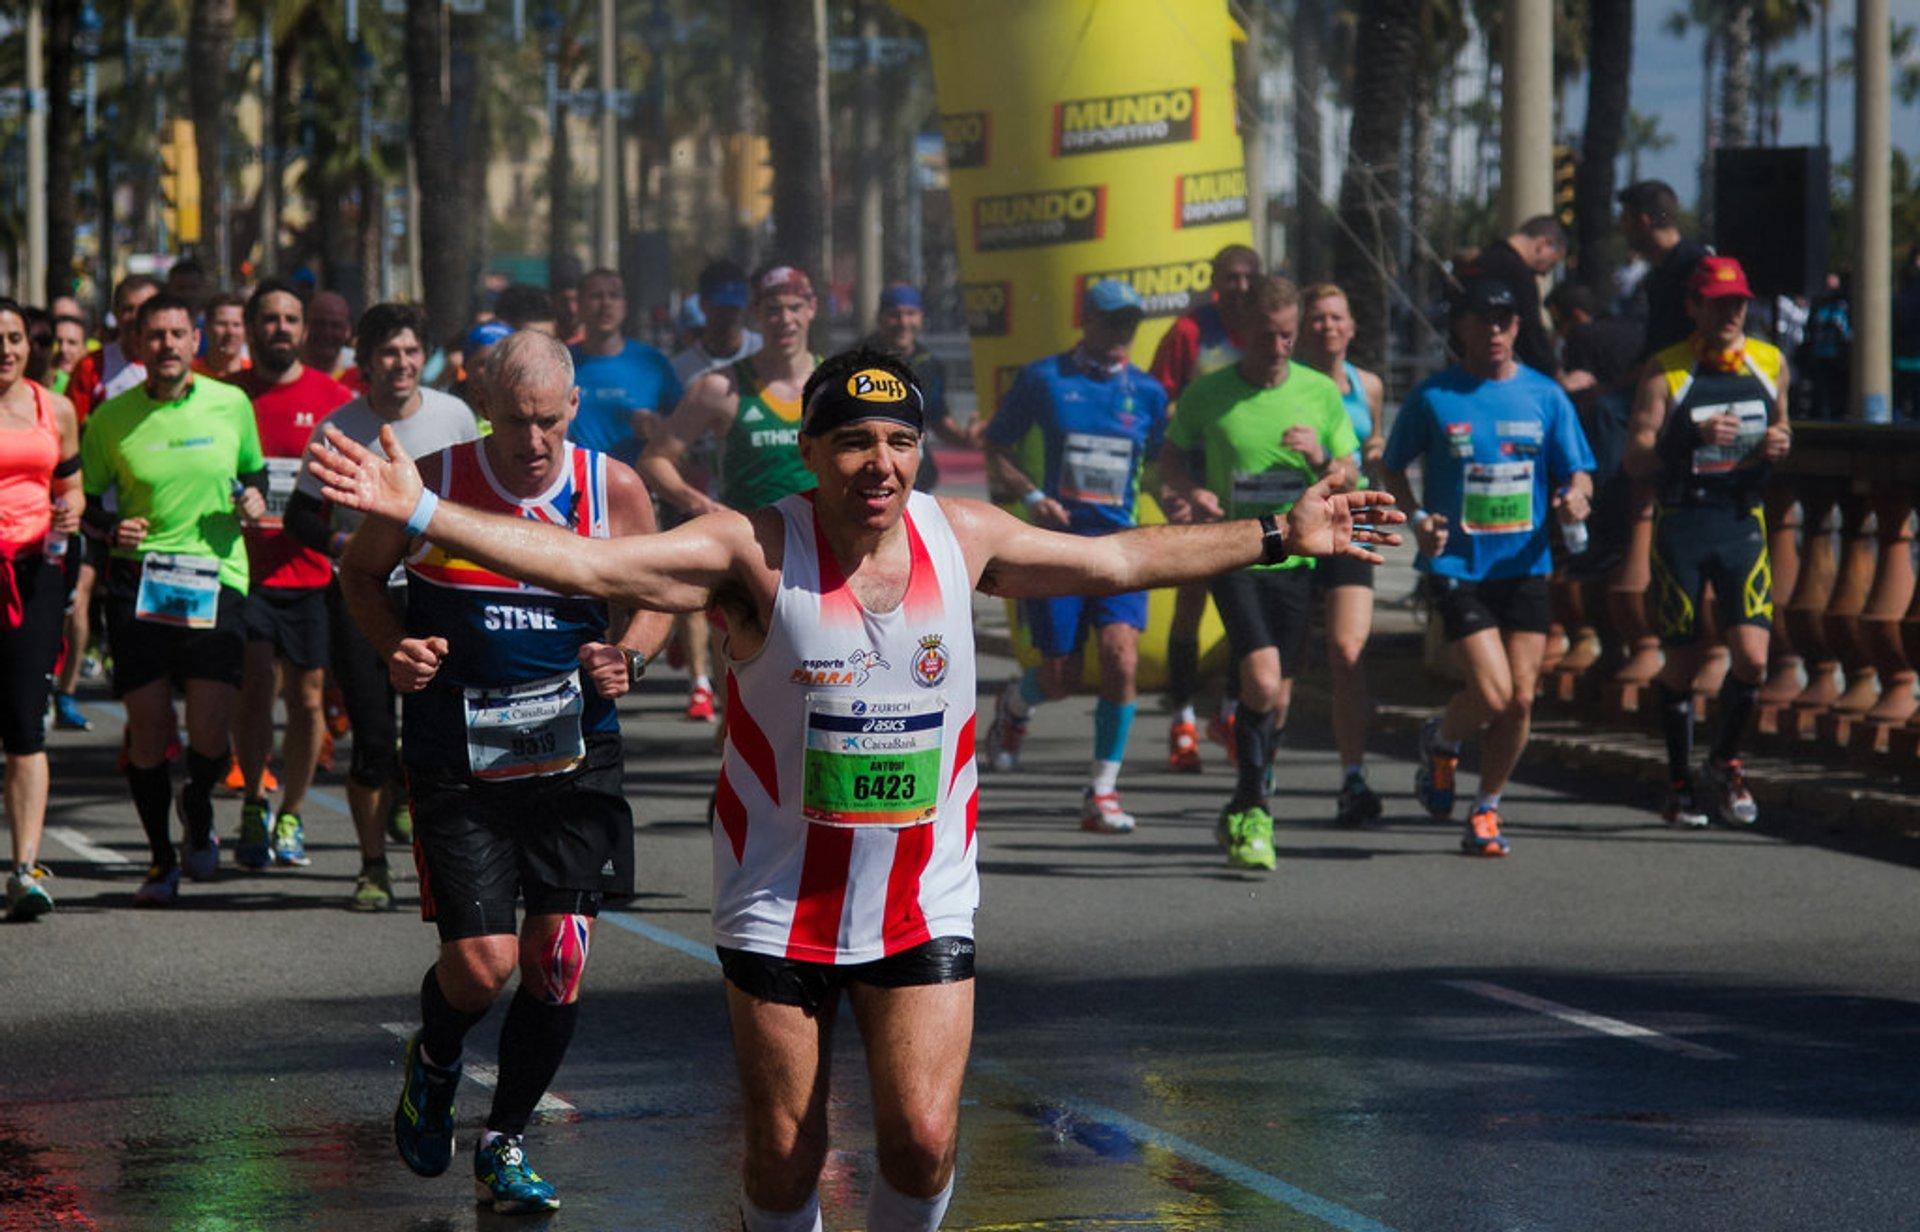 Barcelona Marathon in Barcelona - Best Season 2020